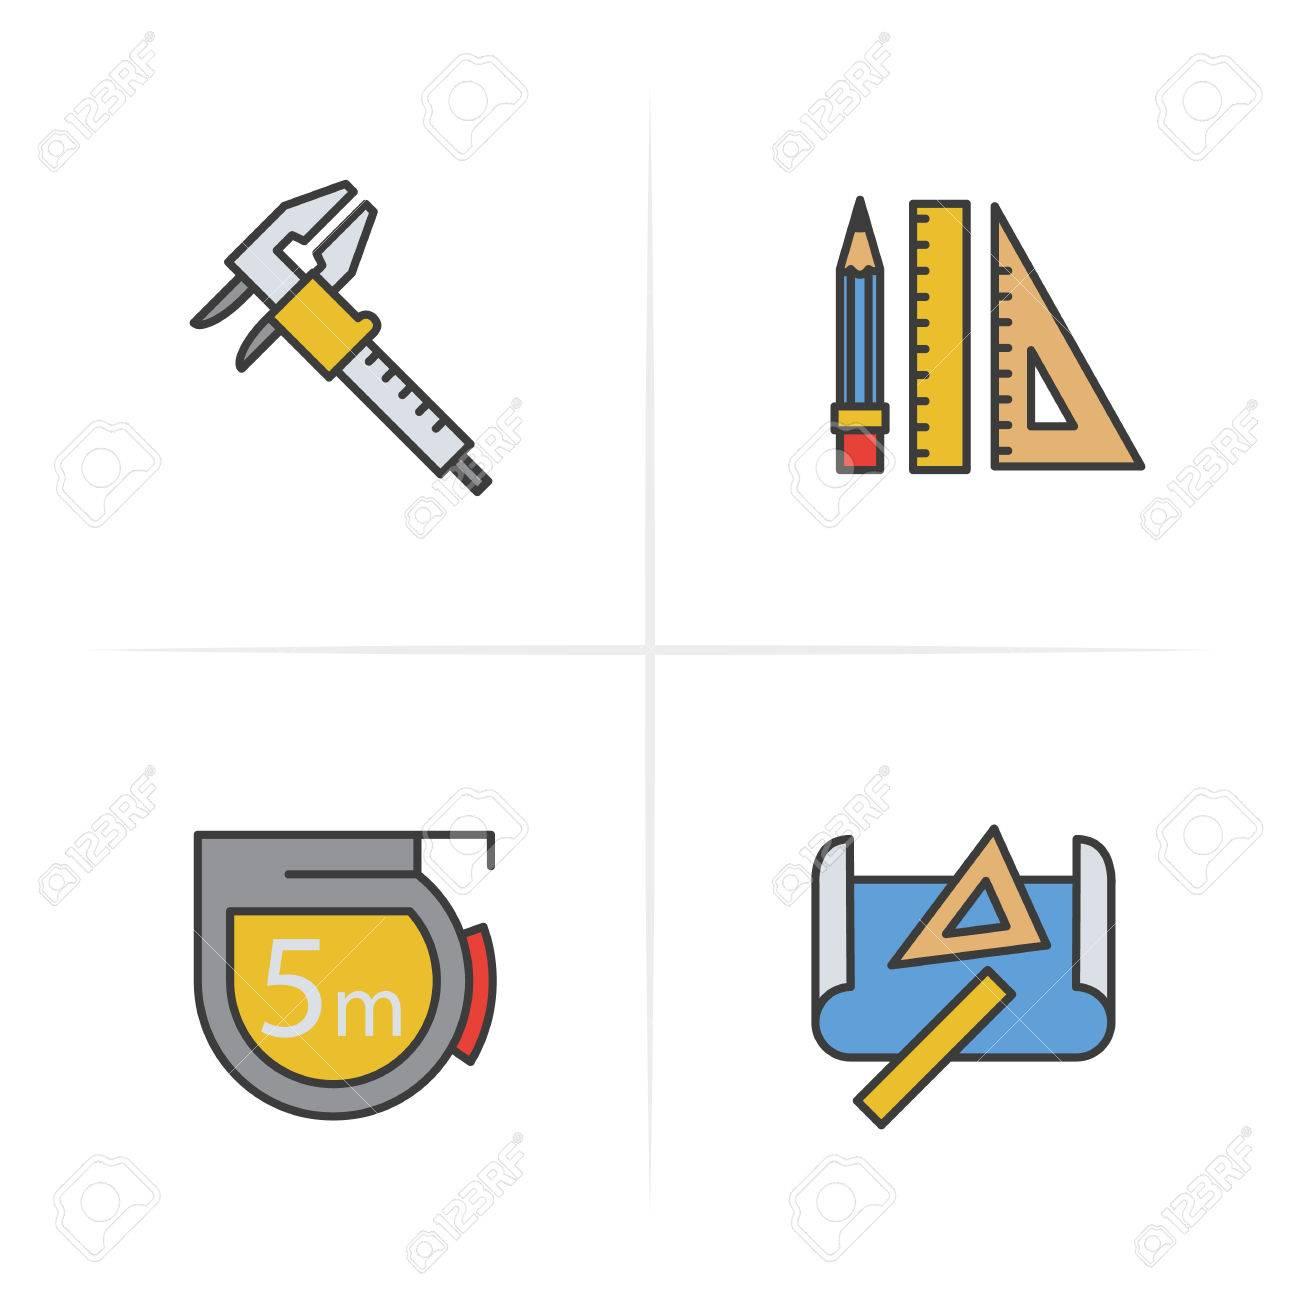 Engineers Measuring Tape Diagram Worksheet And Wiring Engineering Color Icons Set Caliper Pencil Ruler Rh 123rf Com Certificate